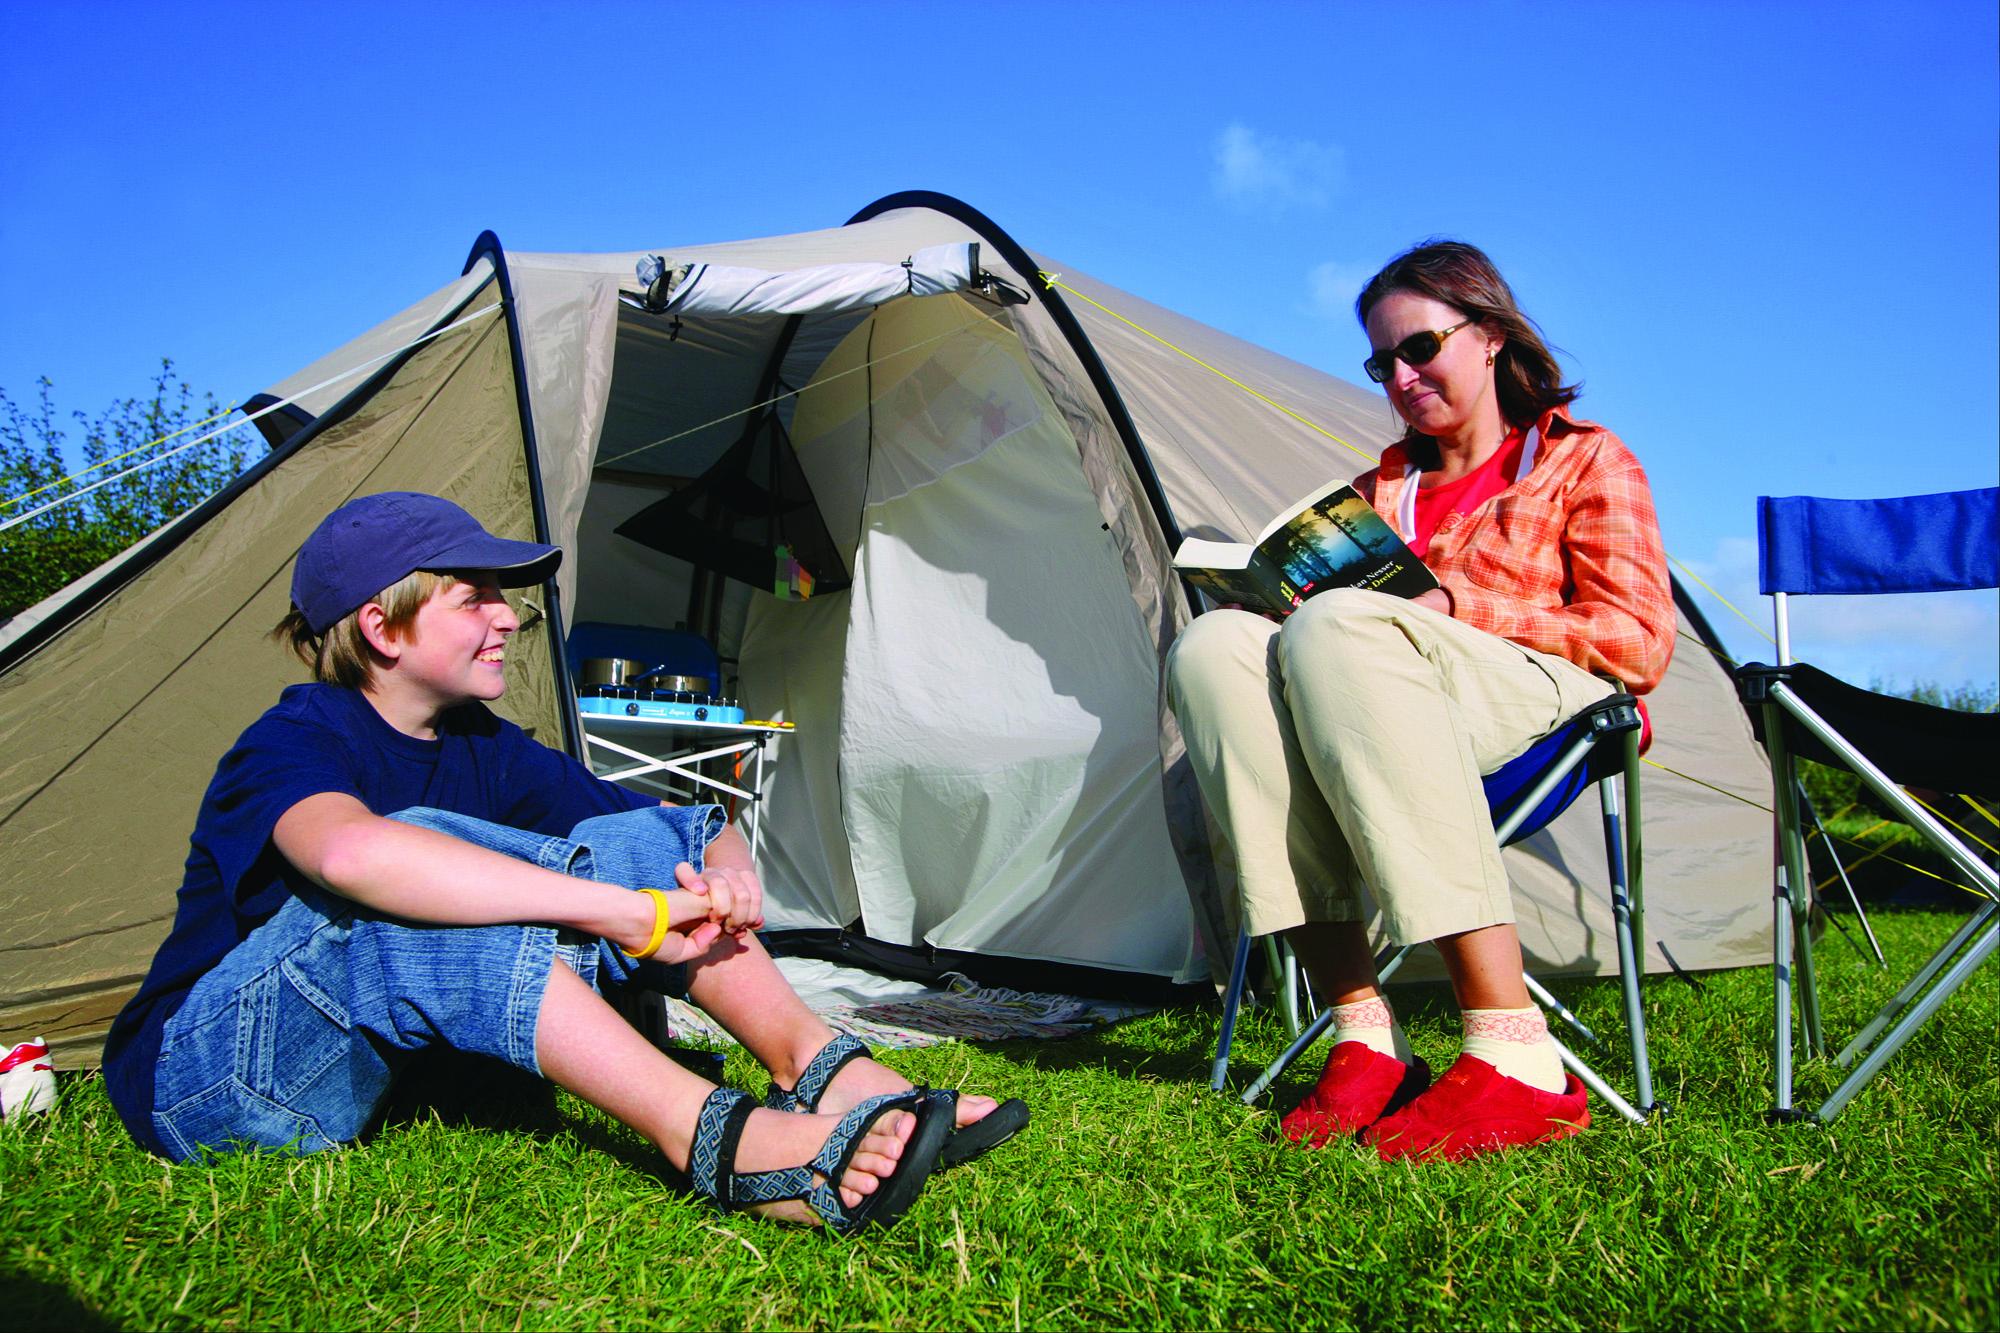 Making Camping Rules